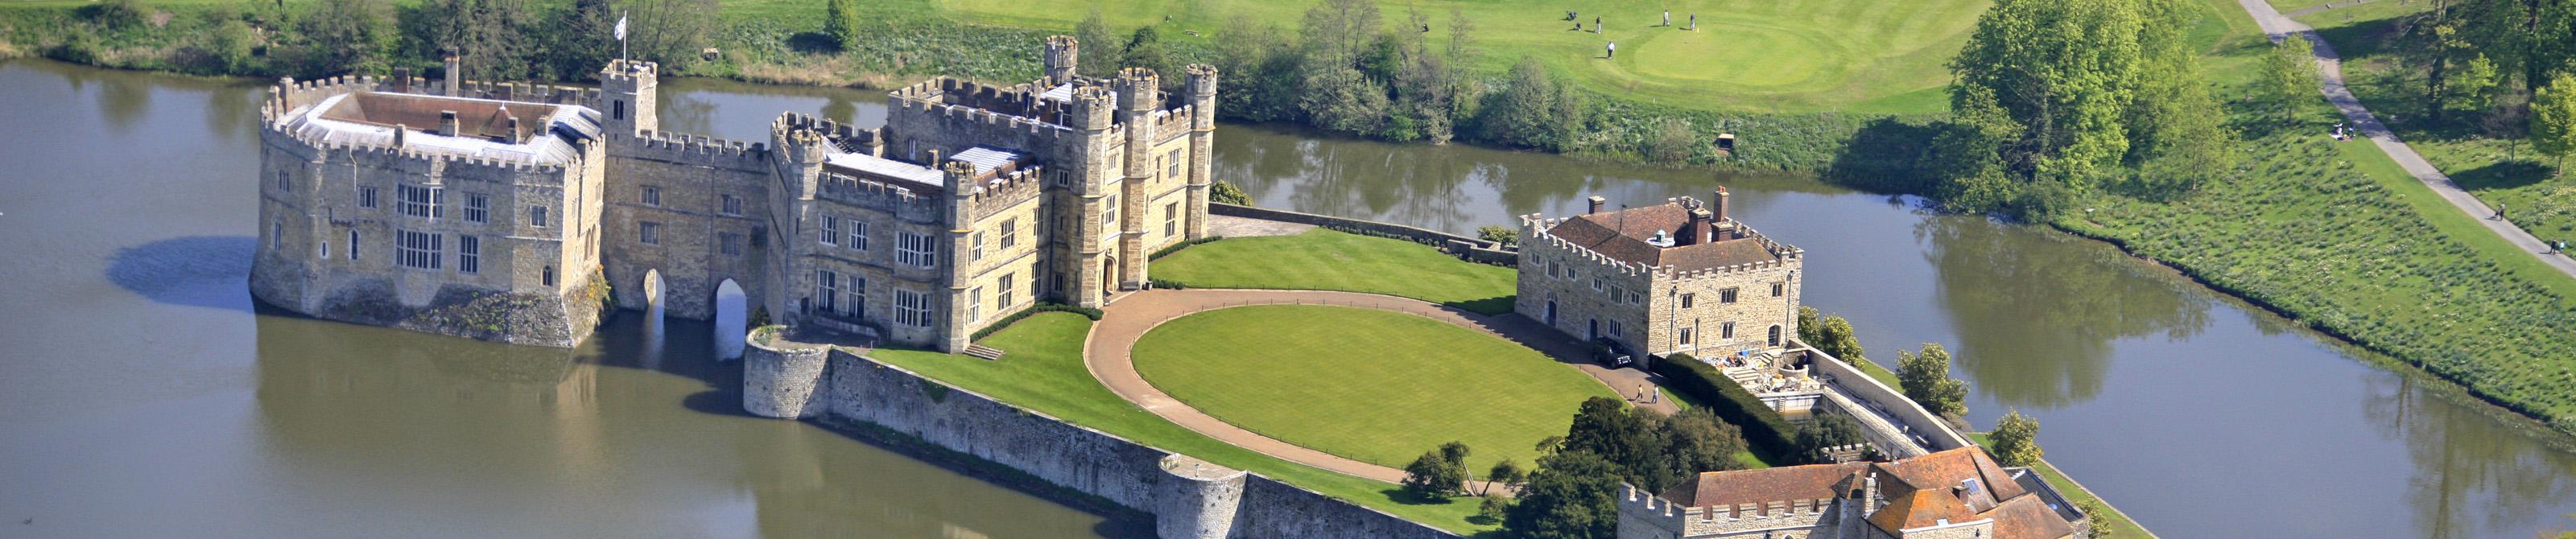 Château de Leeds Kent - GB